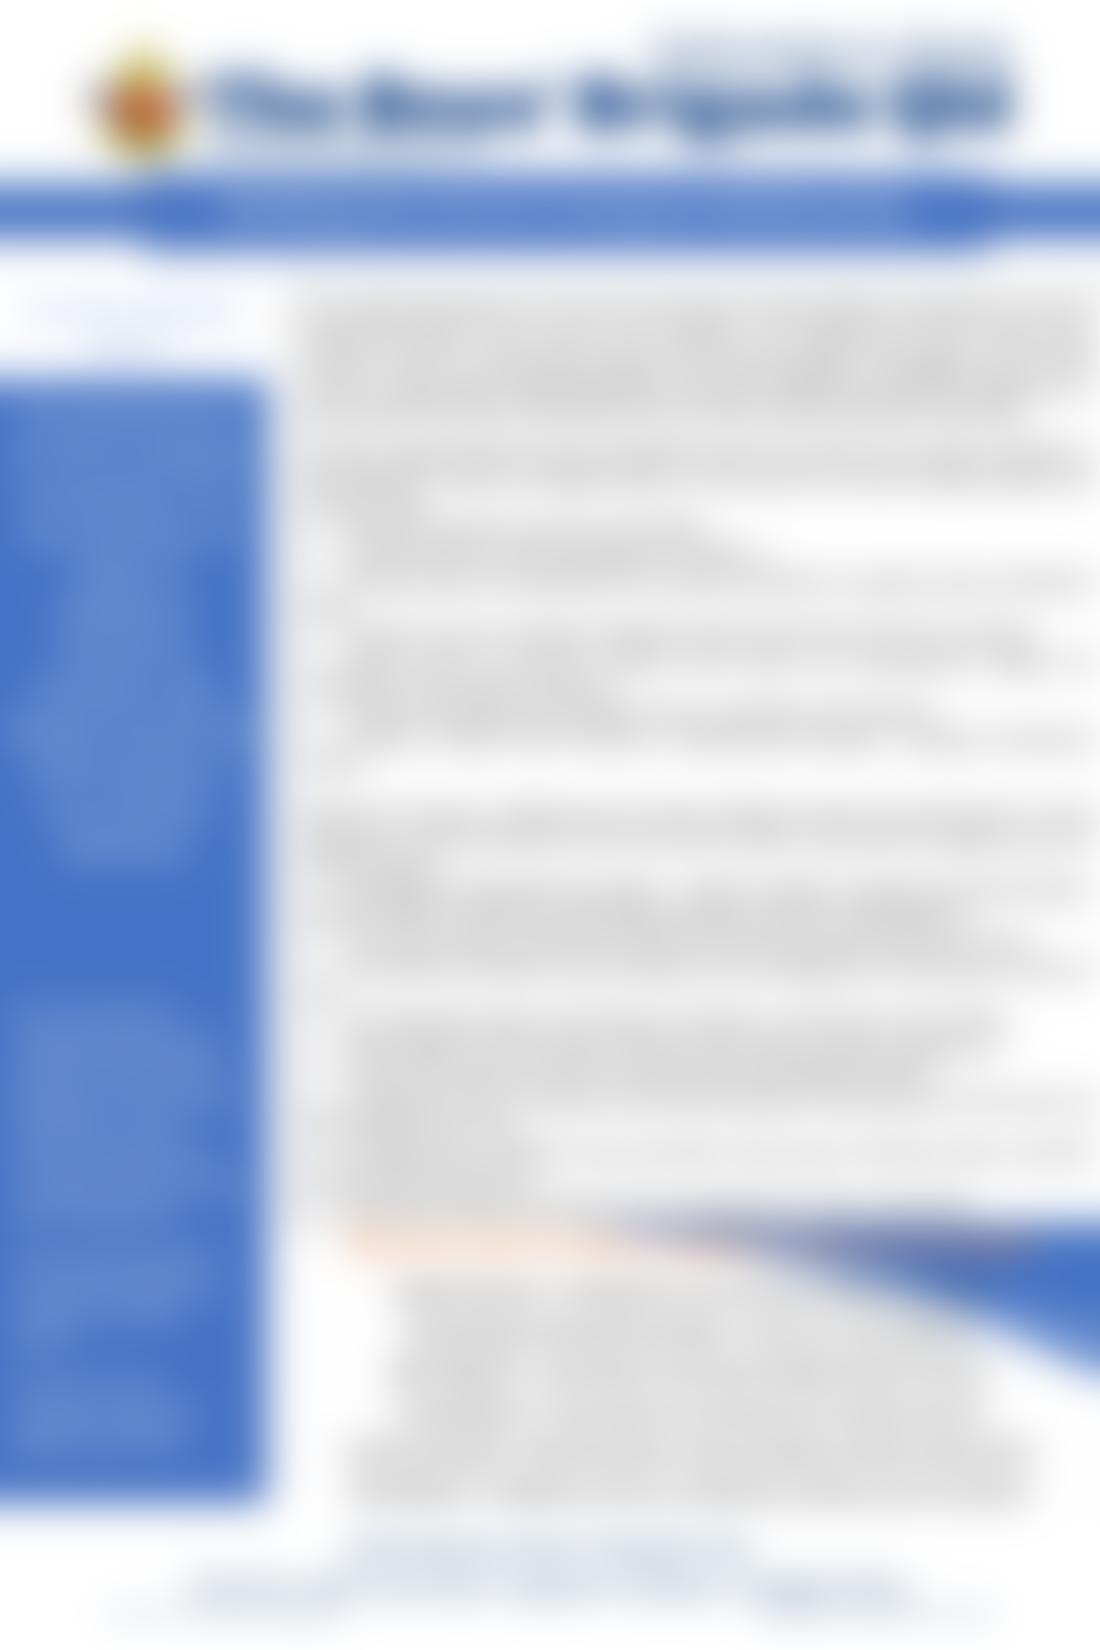 Info Sheet - Funnel Marketing Strategy Part 2 Interest 2020